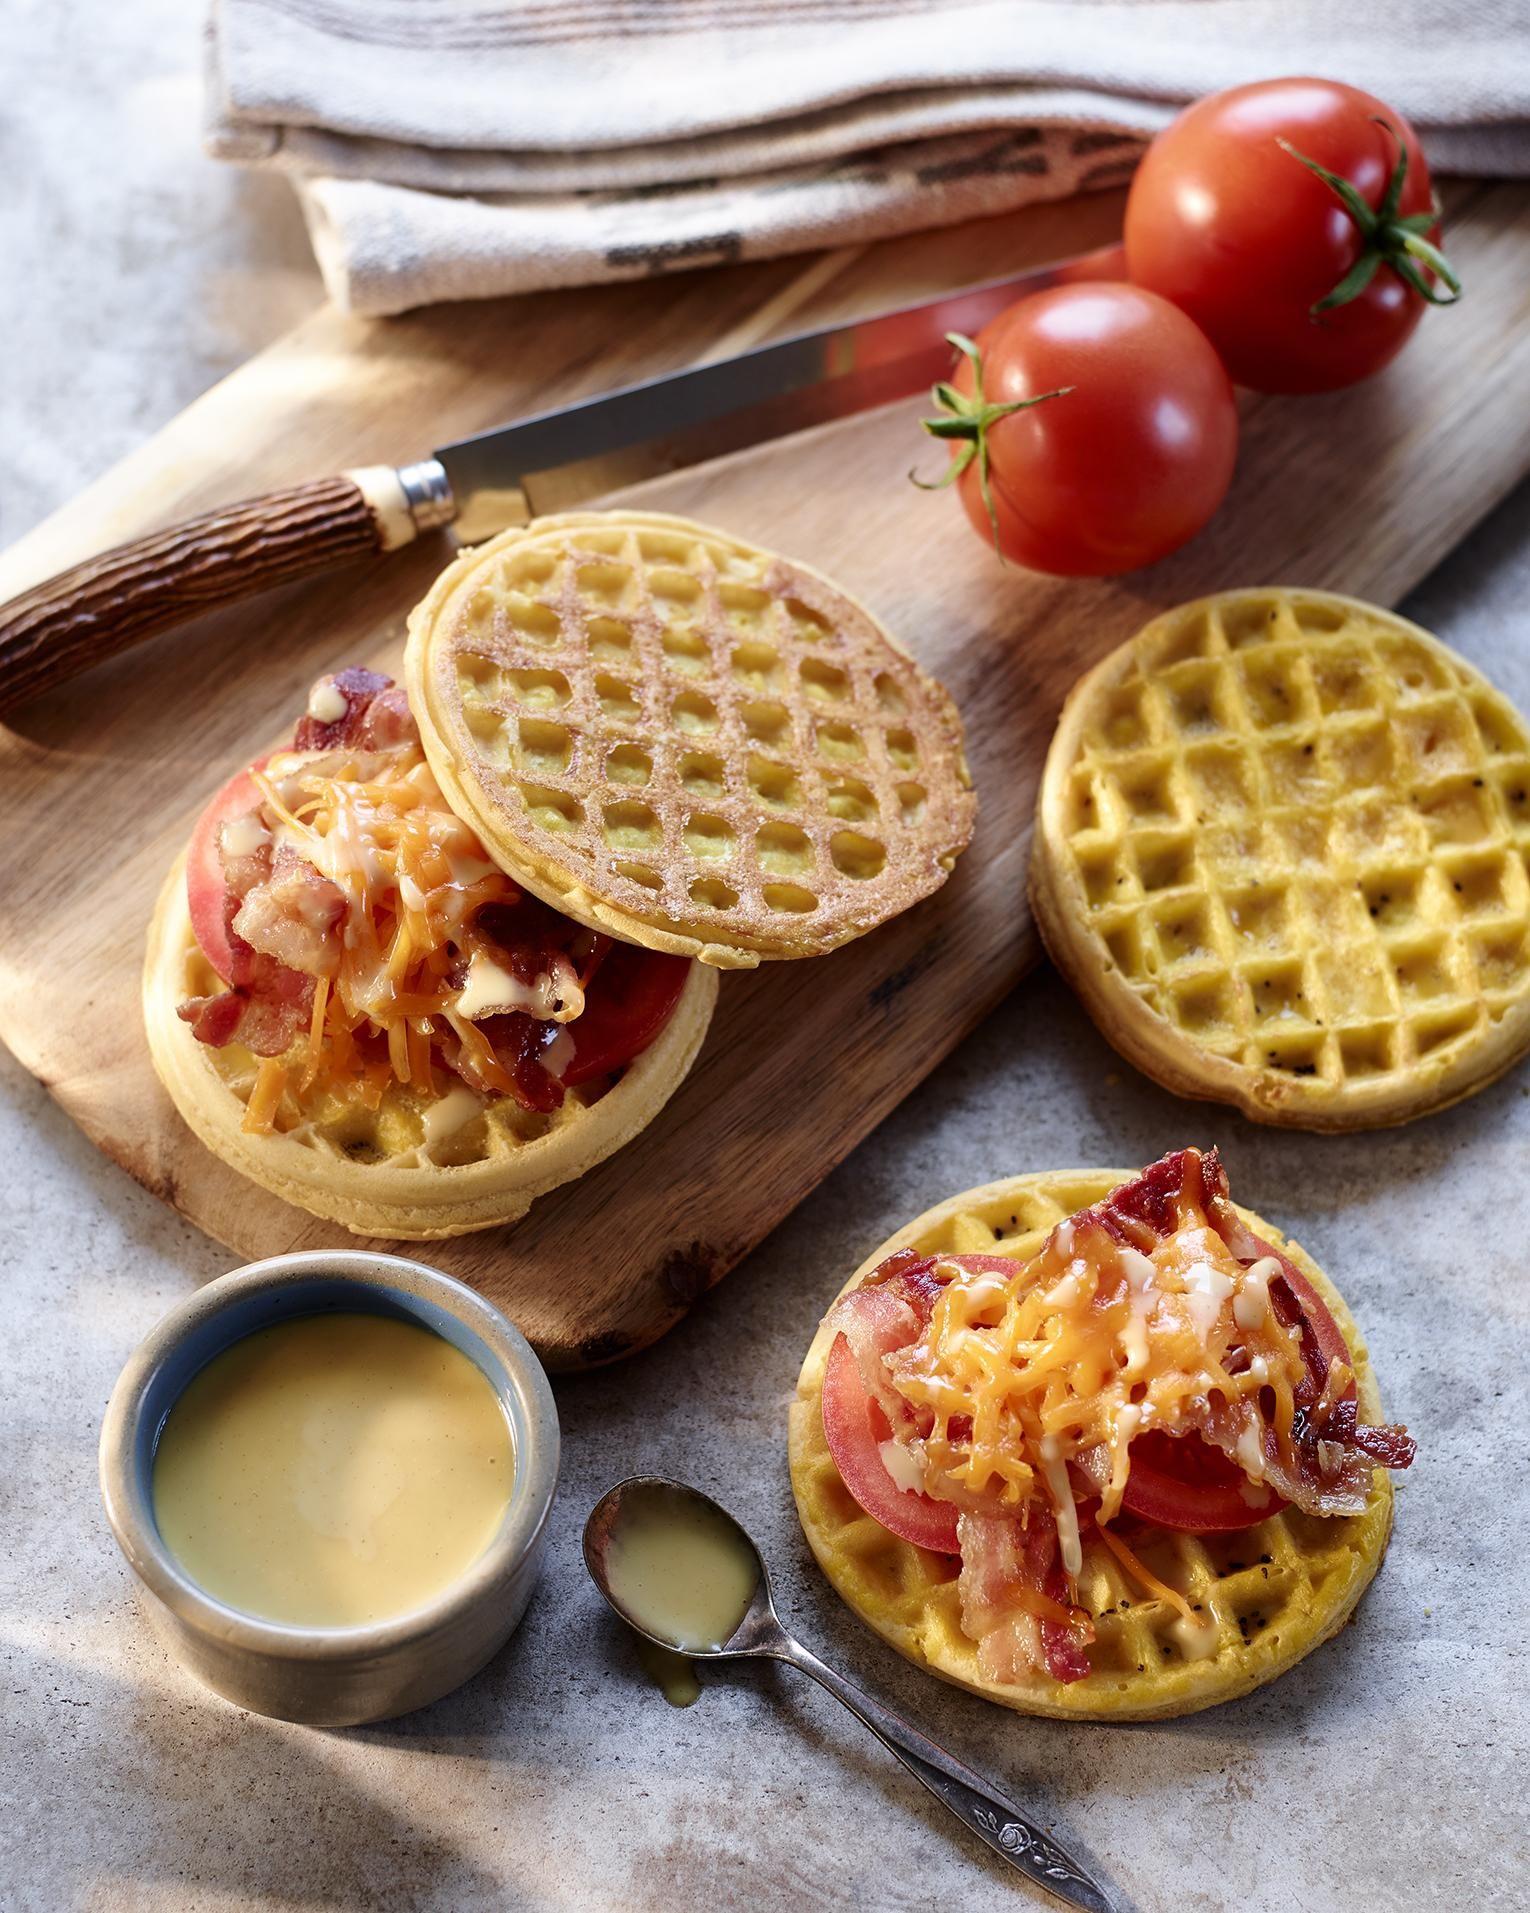 Foodtruck breakfast waffle